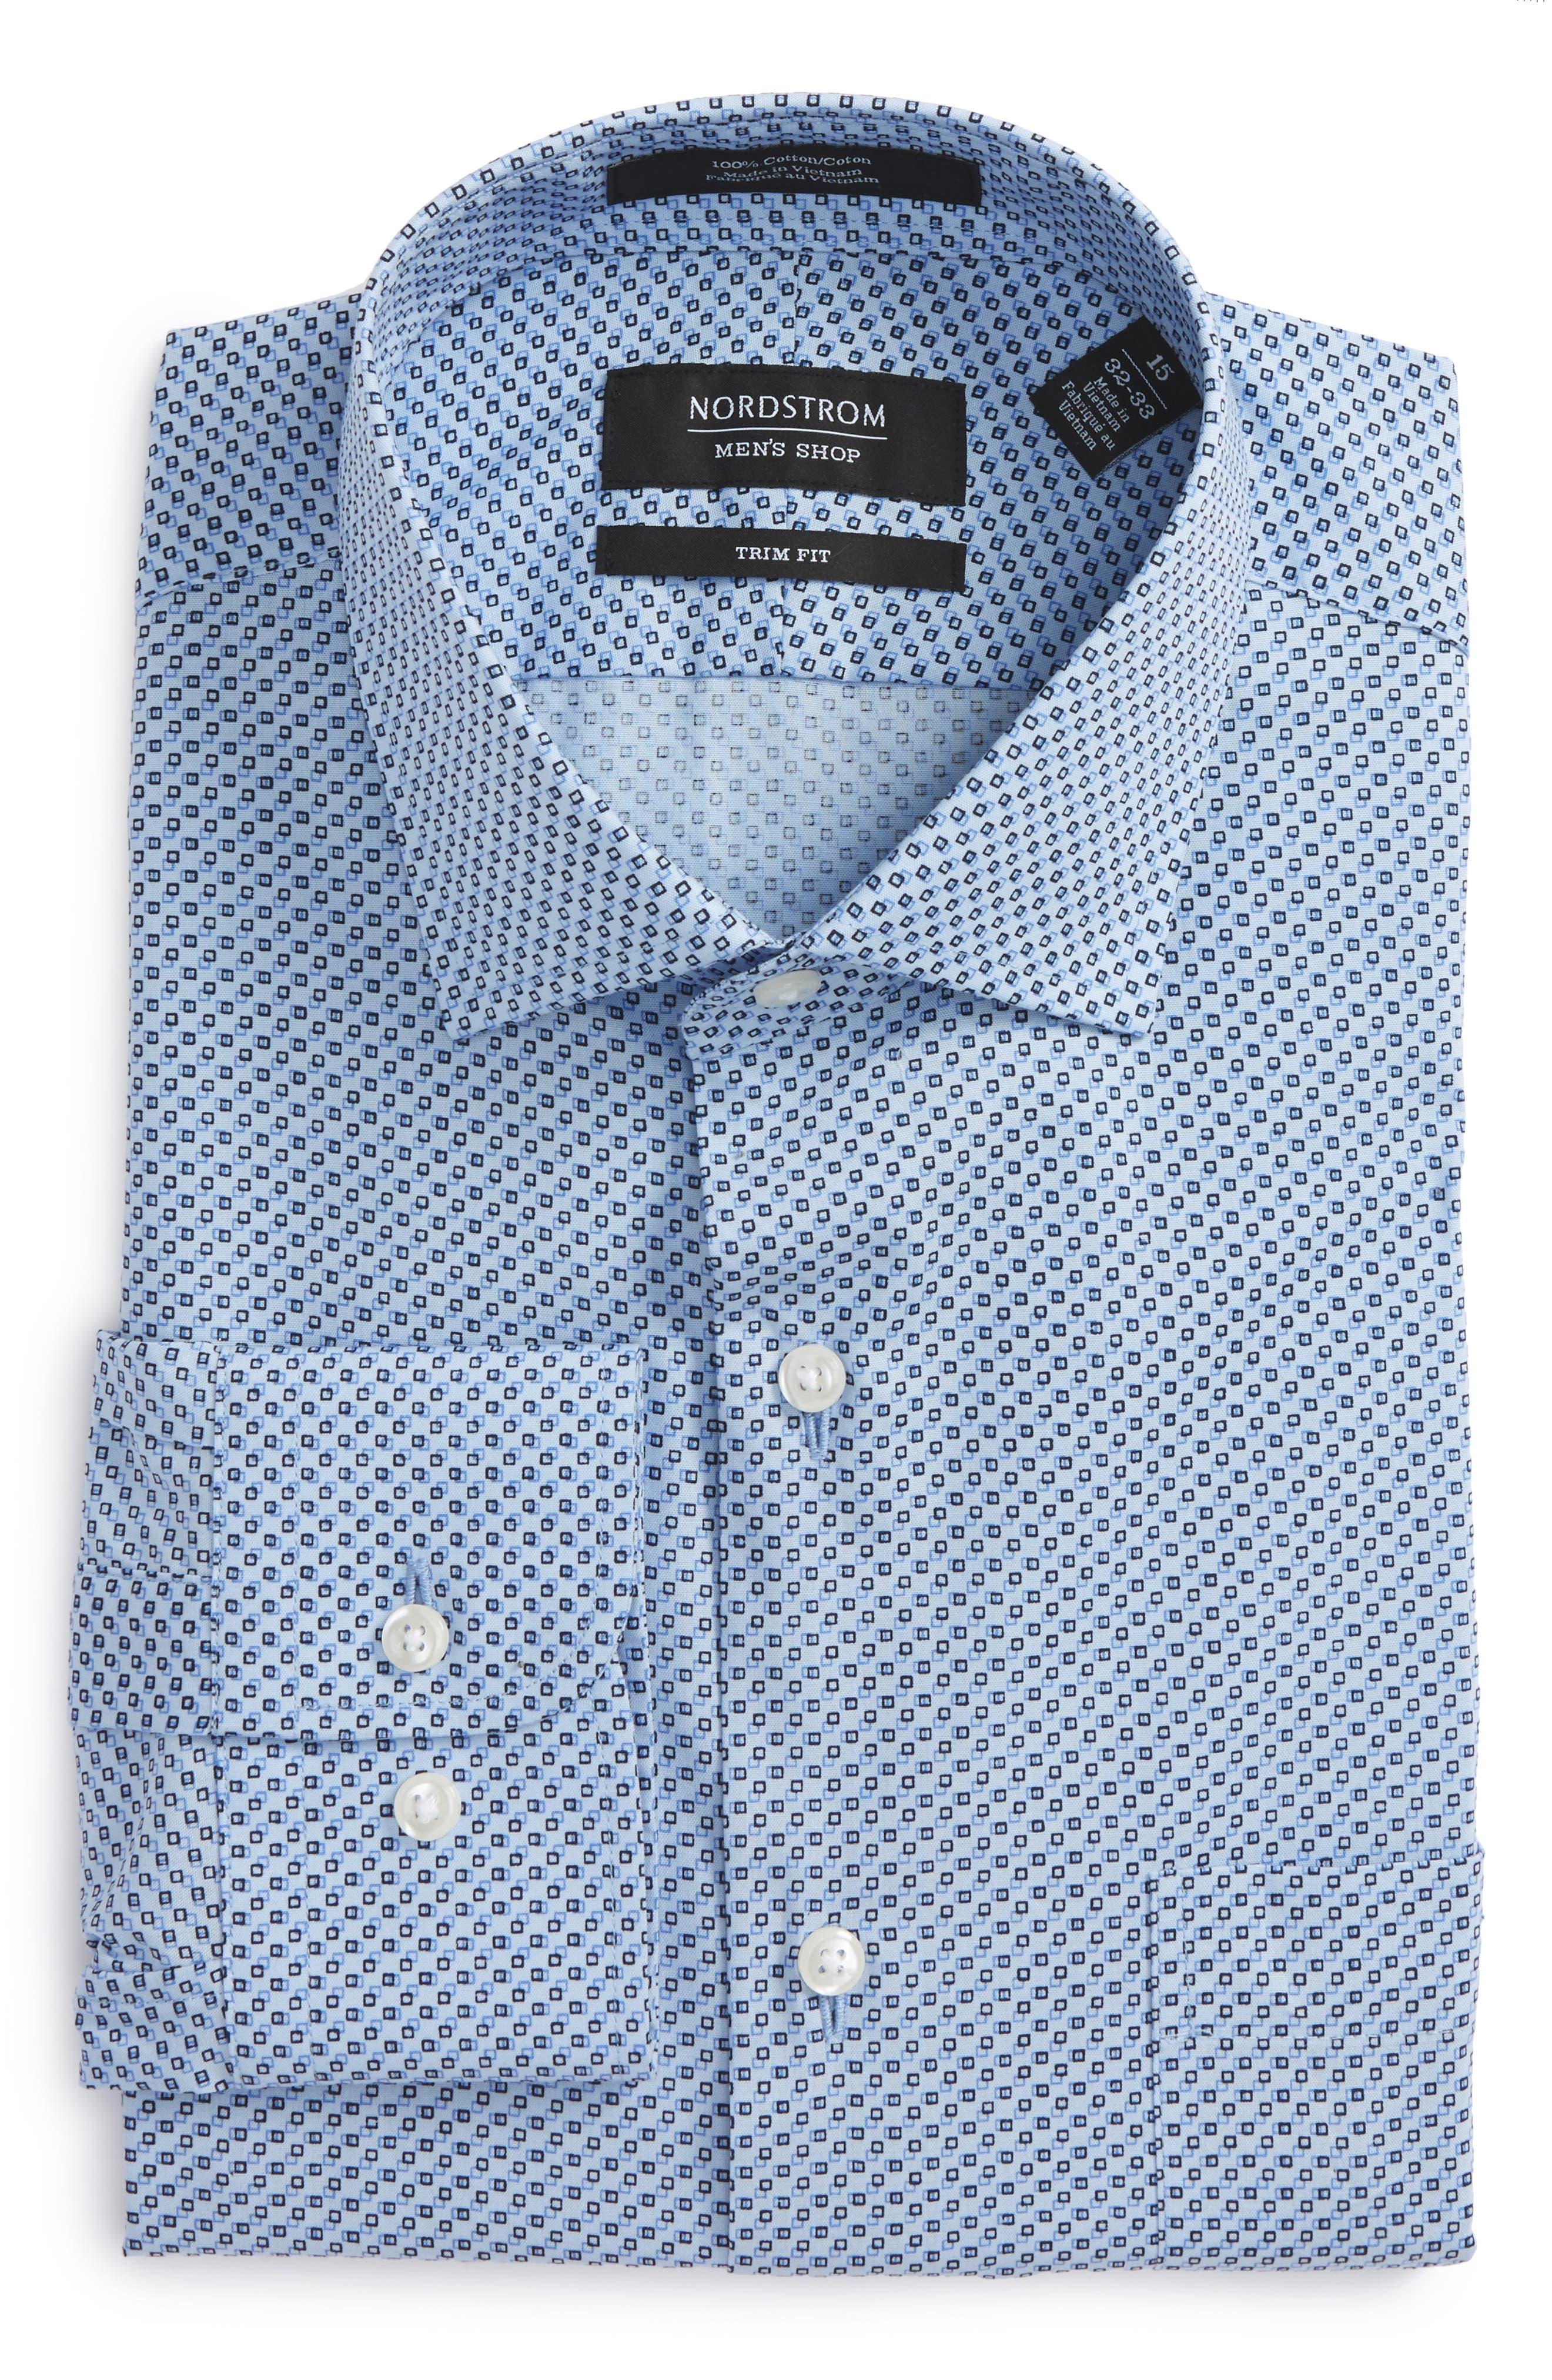 NORDSTROM MENS SHOP Trim Fit Geometric Dress Shirt